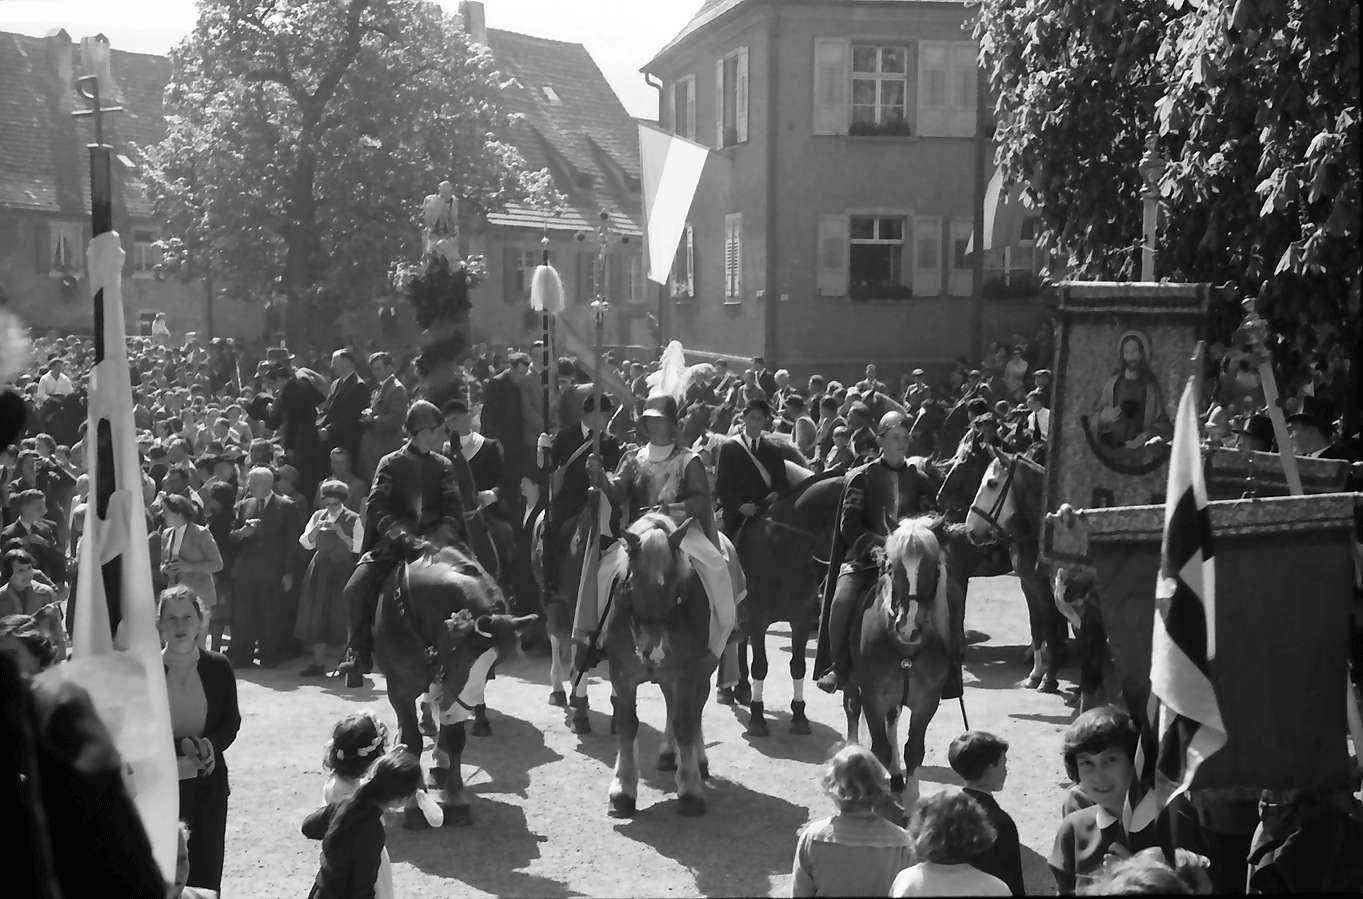 Freiburg; St. Georgen: St. Georgsritt; Georgsritter und zwei Knappen vor Kirche, Bild 1